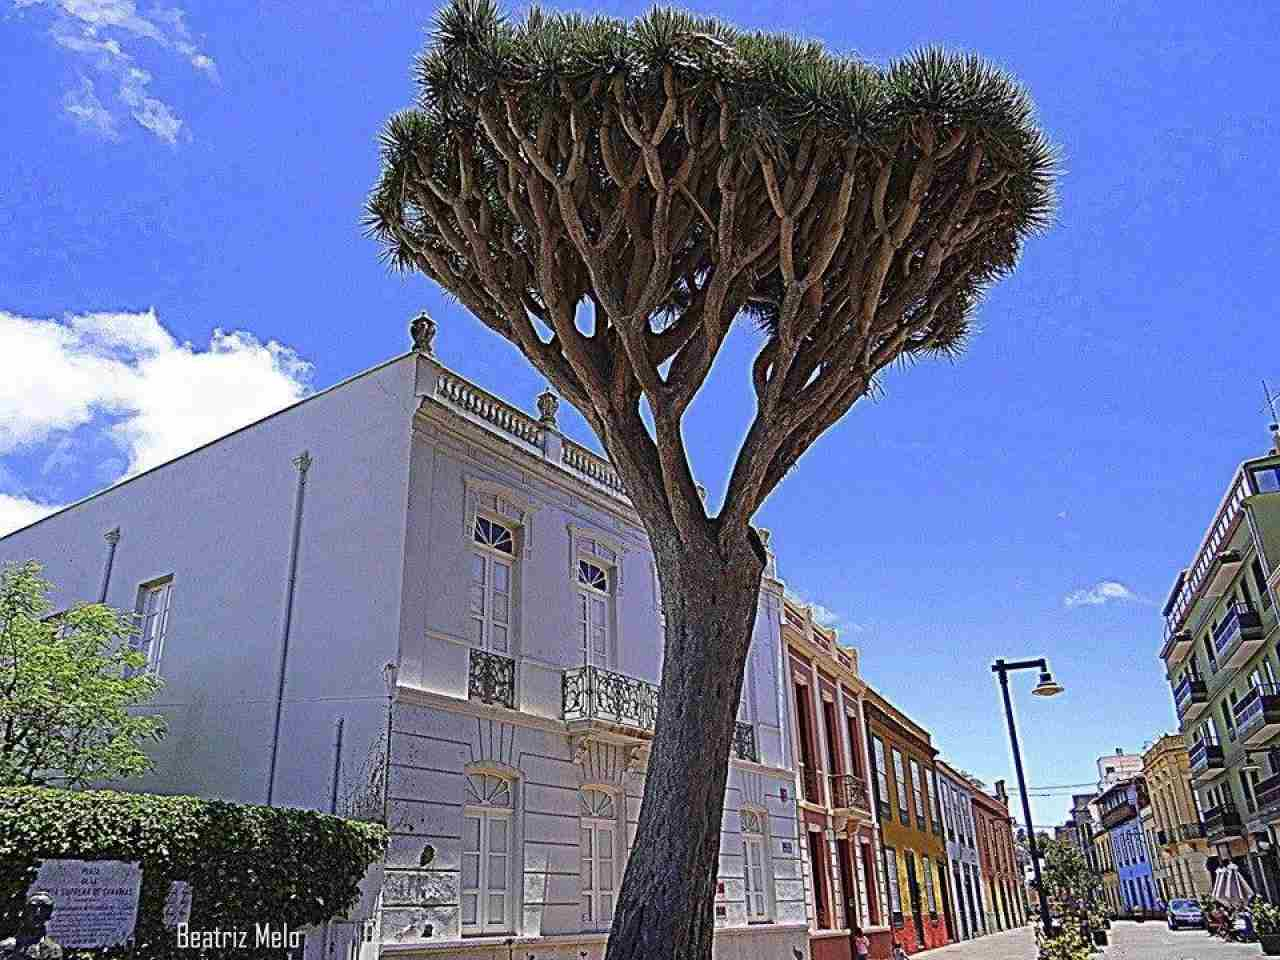 Alquiler de habitaciones San Cristóbal de La Laguna, Santa Cruz de Tenerife